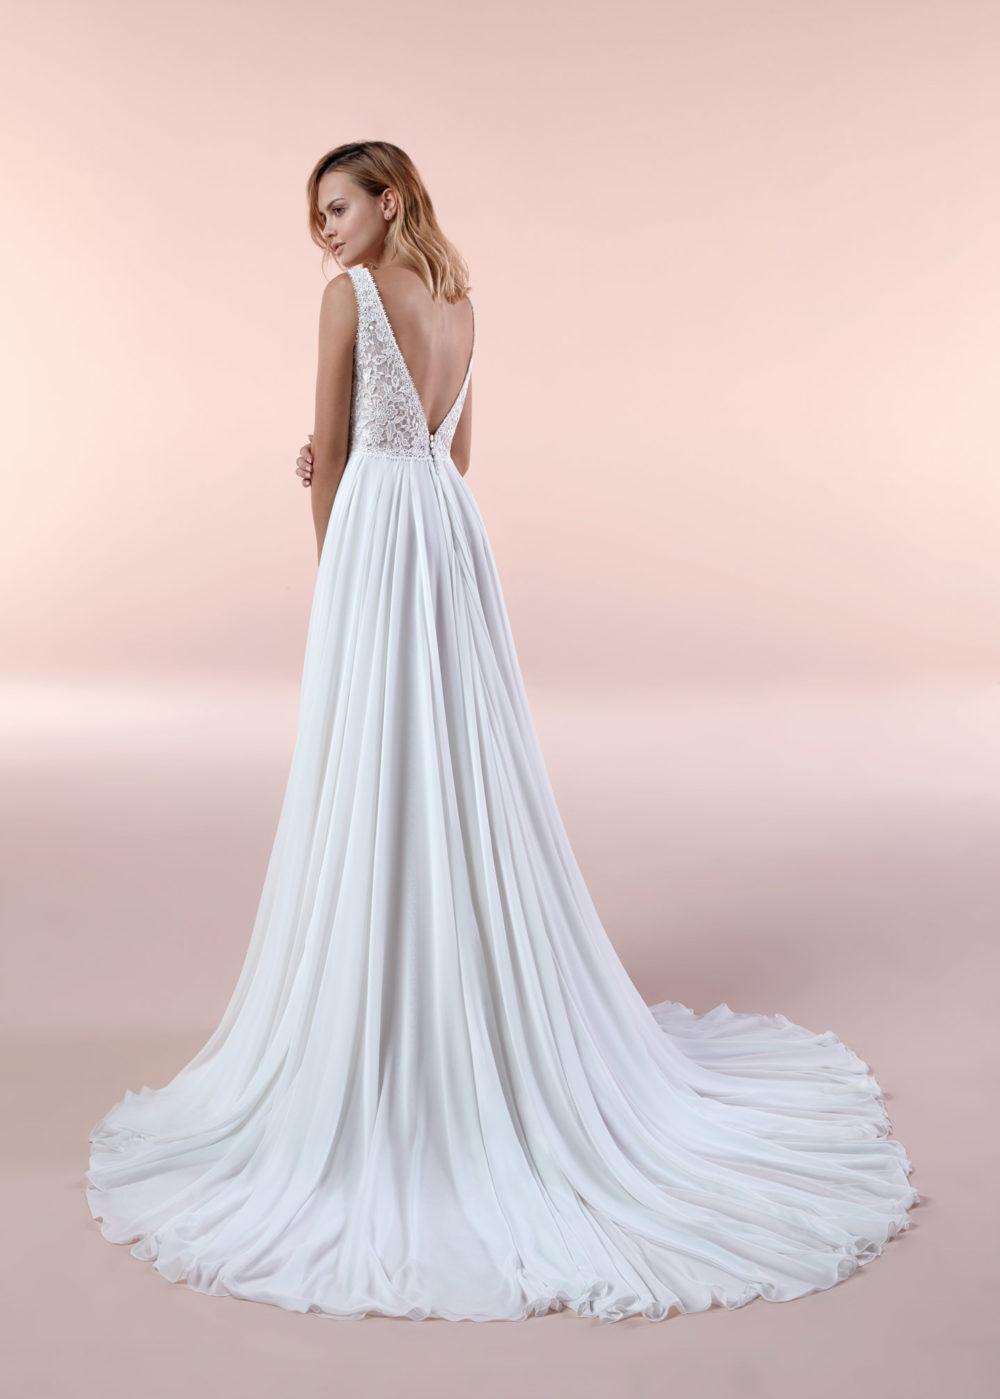 Mariages: abito da sposa Boho Chic Nicole 2020 a Vicenza Verona Padova Veneto BCA20071-2